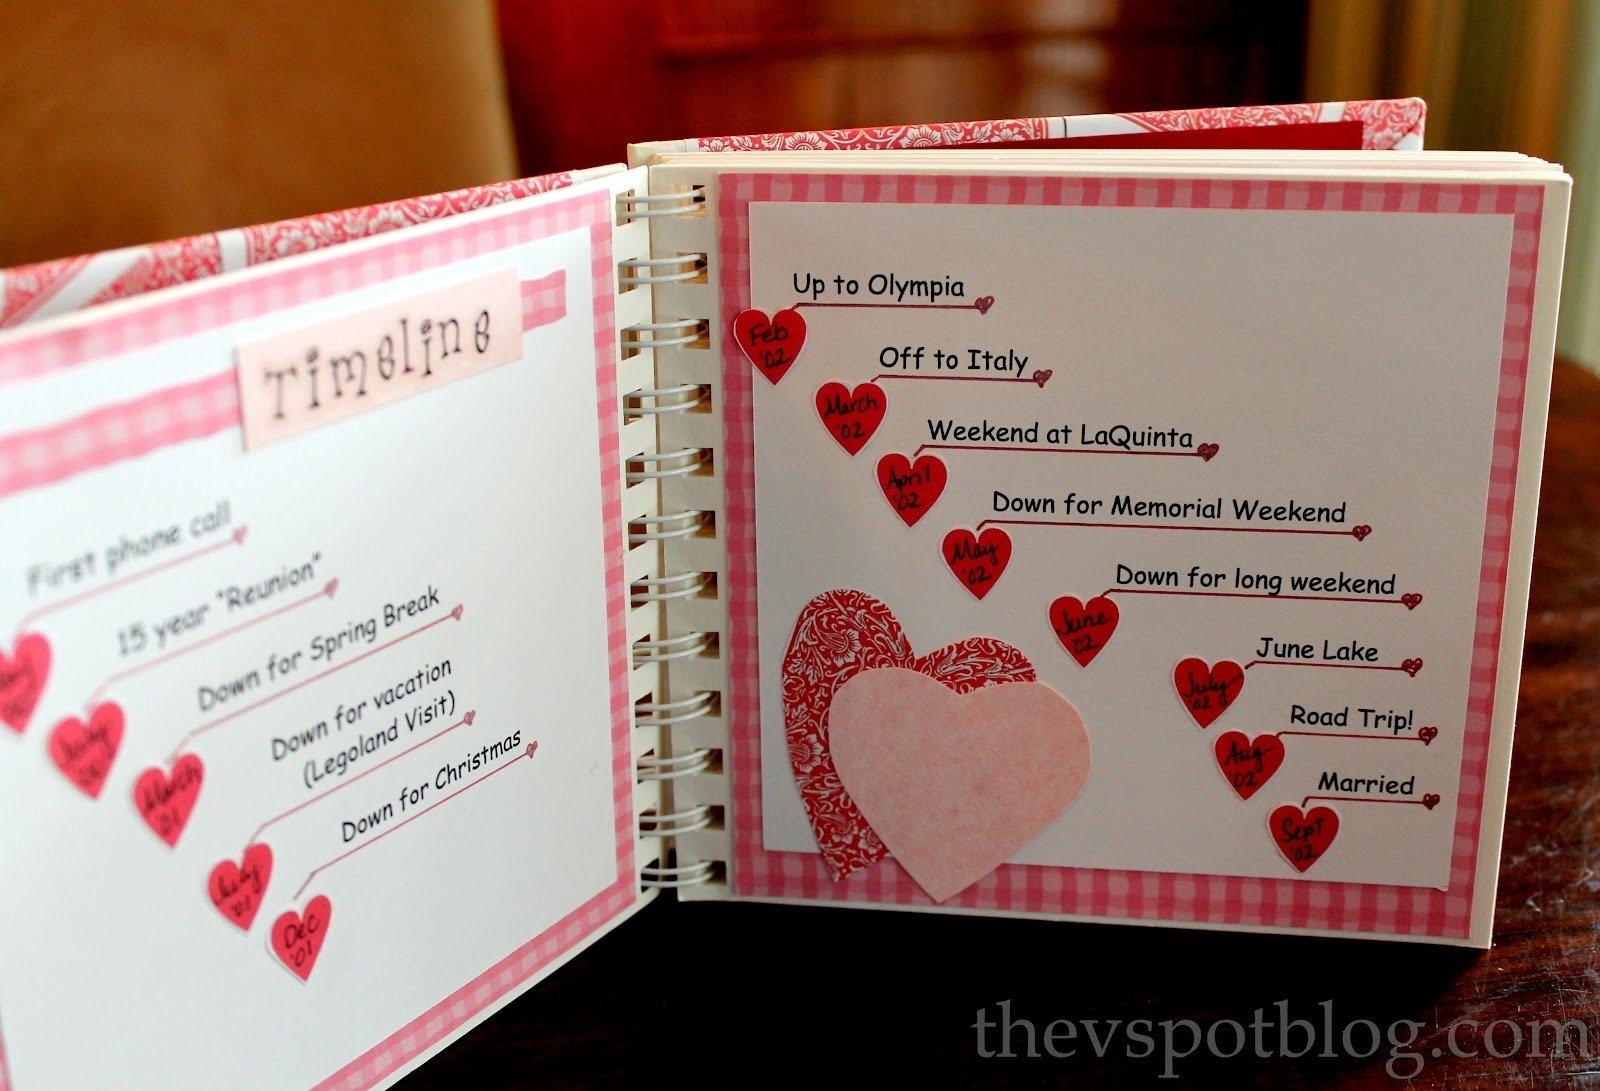 10 Stylish Valentine Gifts Ideas For Him valentine day new creative ideas boyfriend husband him home art 25 2020